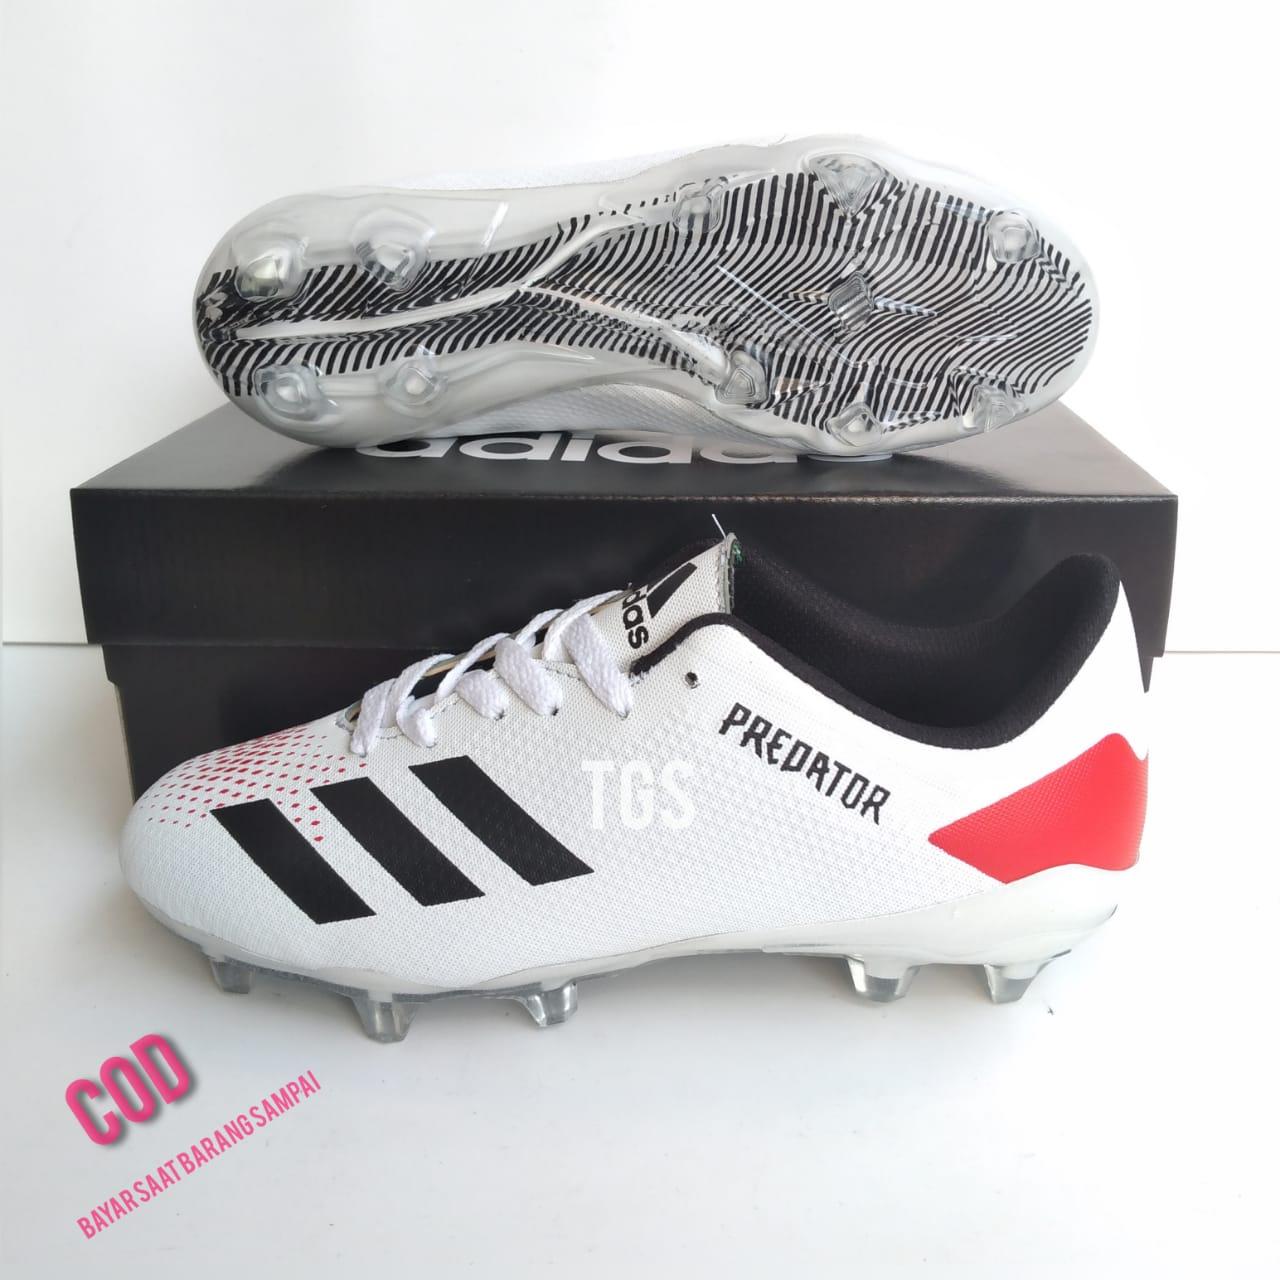 Sepatu Bola_Adidas_Predator White Black Red Terbaru